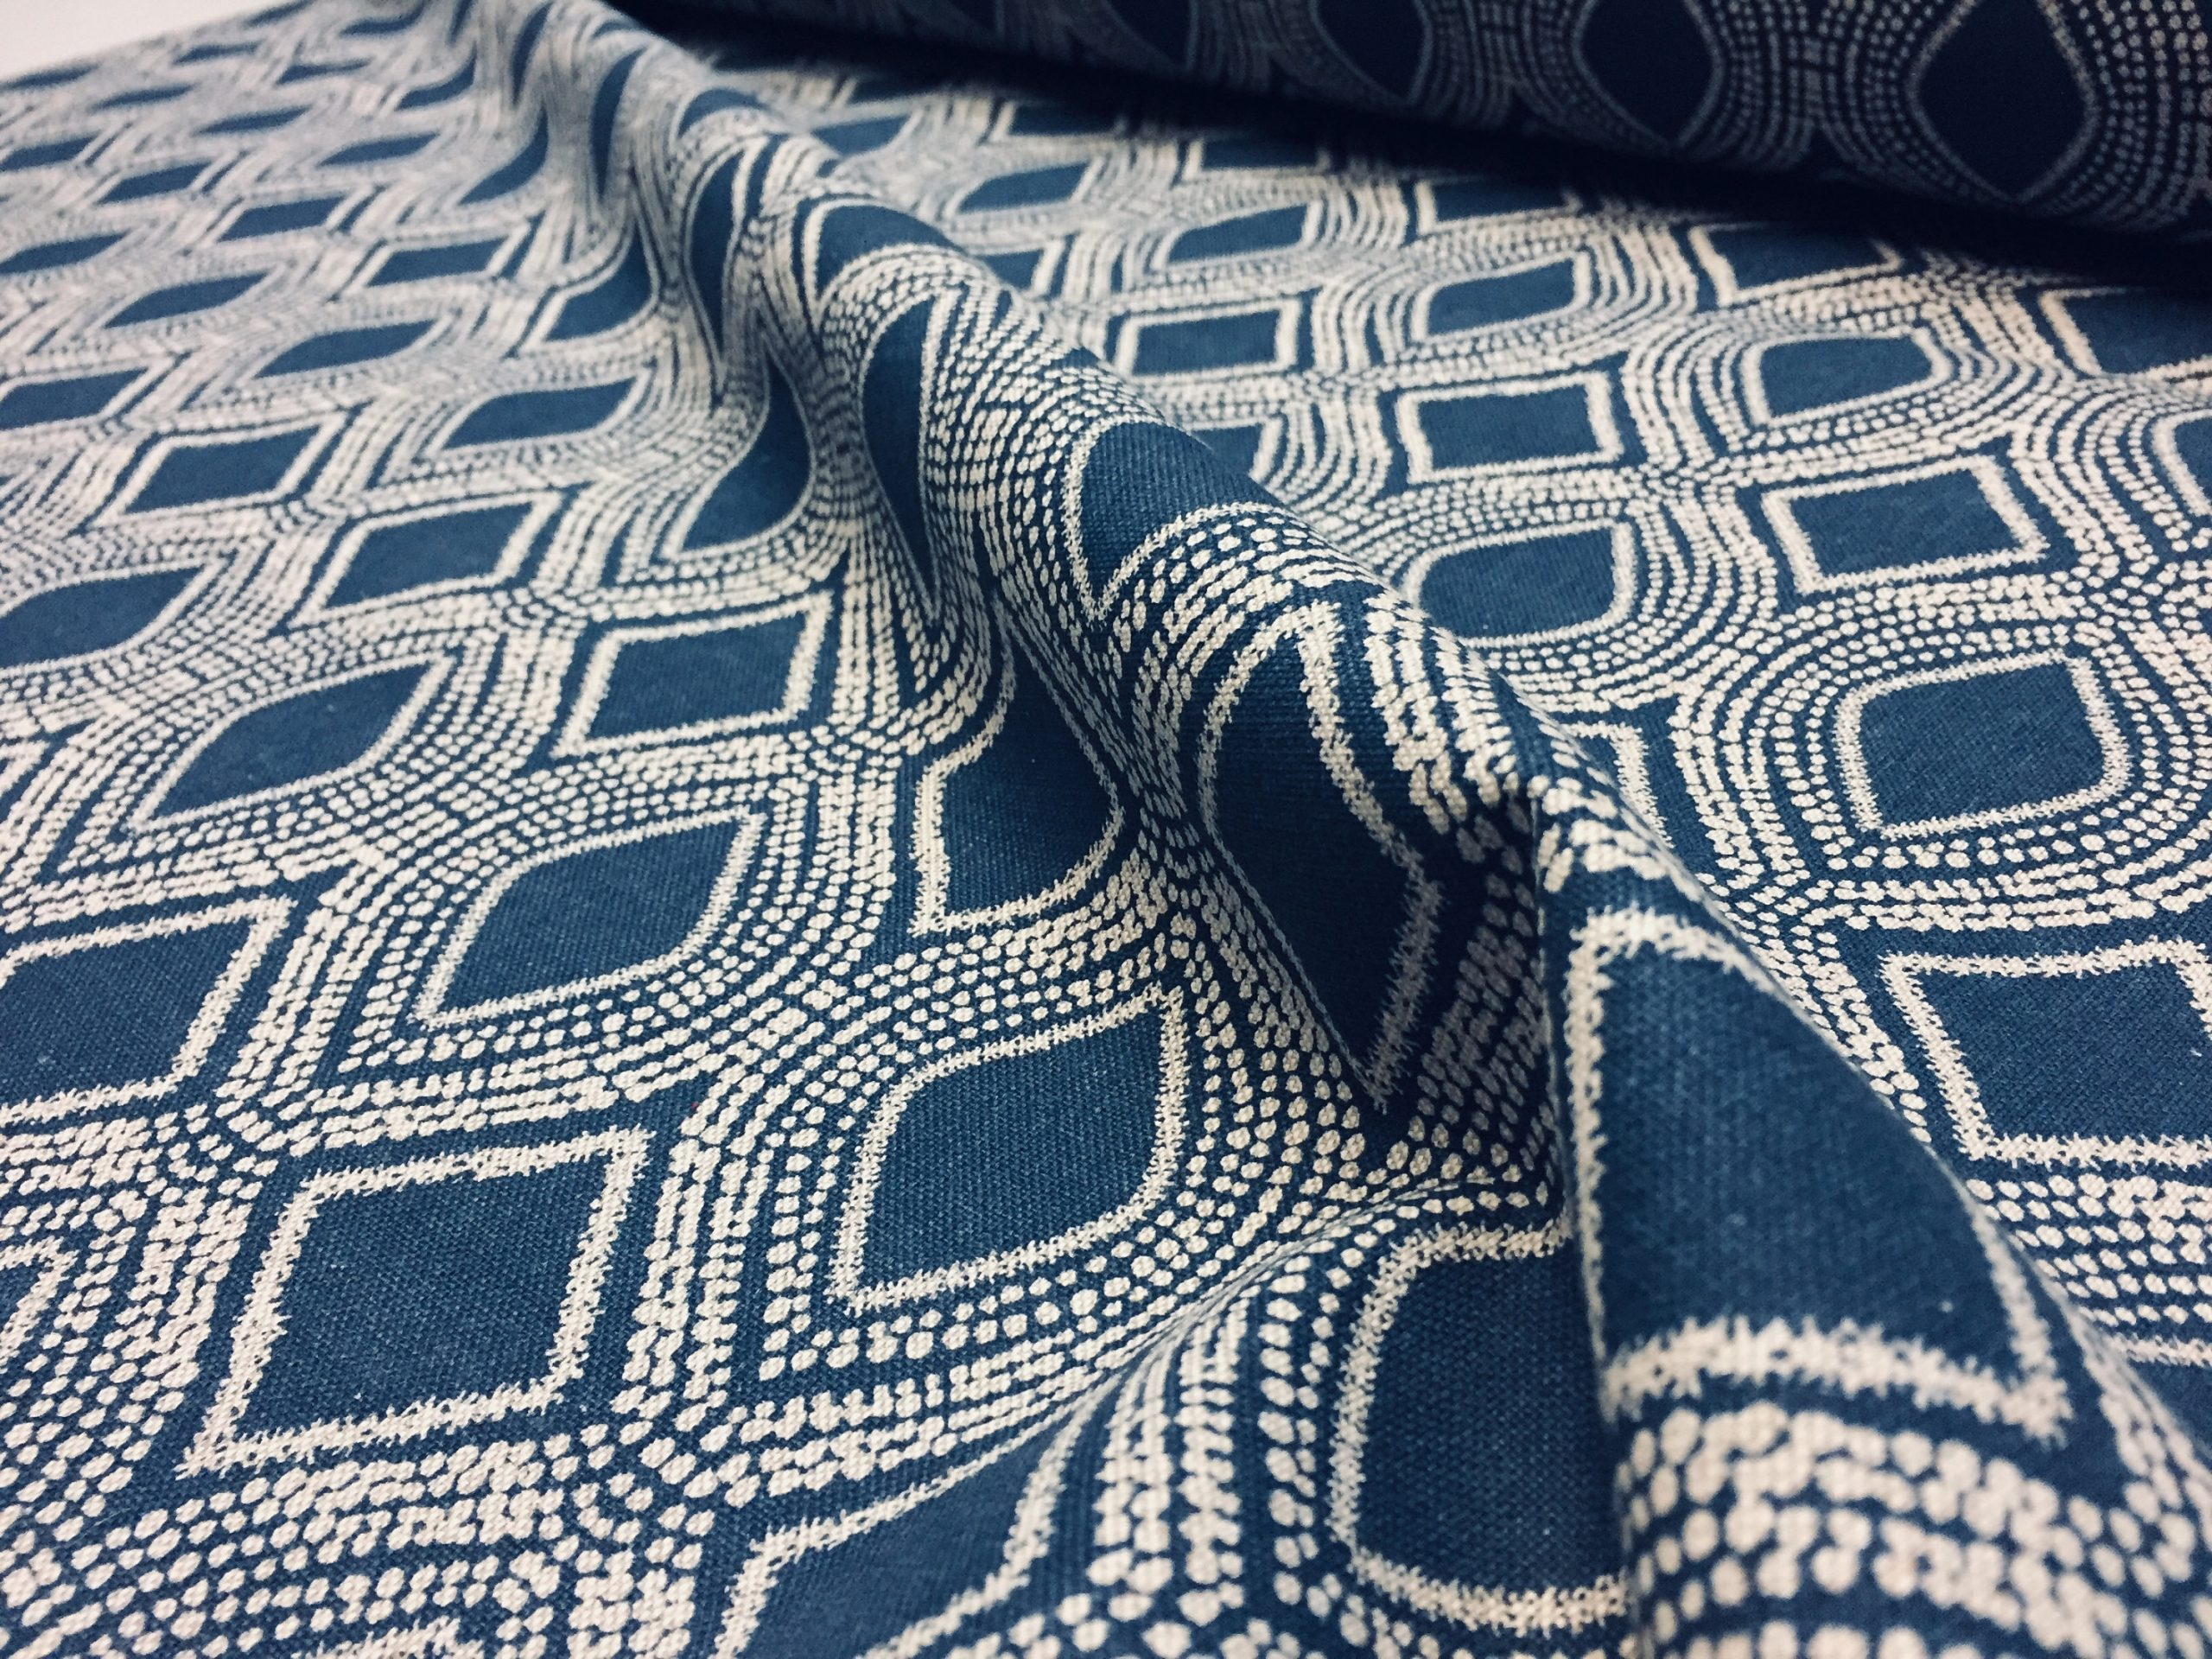 Art Deco Damask Rhombus Diamond Fabric Linen Look Material – Furnishing, Curtains, Upholstery – 280cm Wide – Navy Blue & Cream